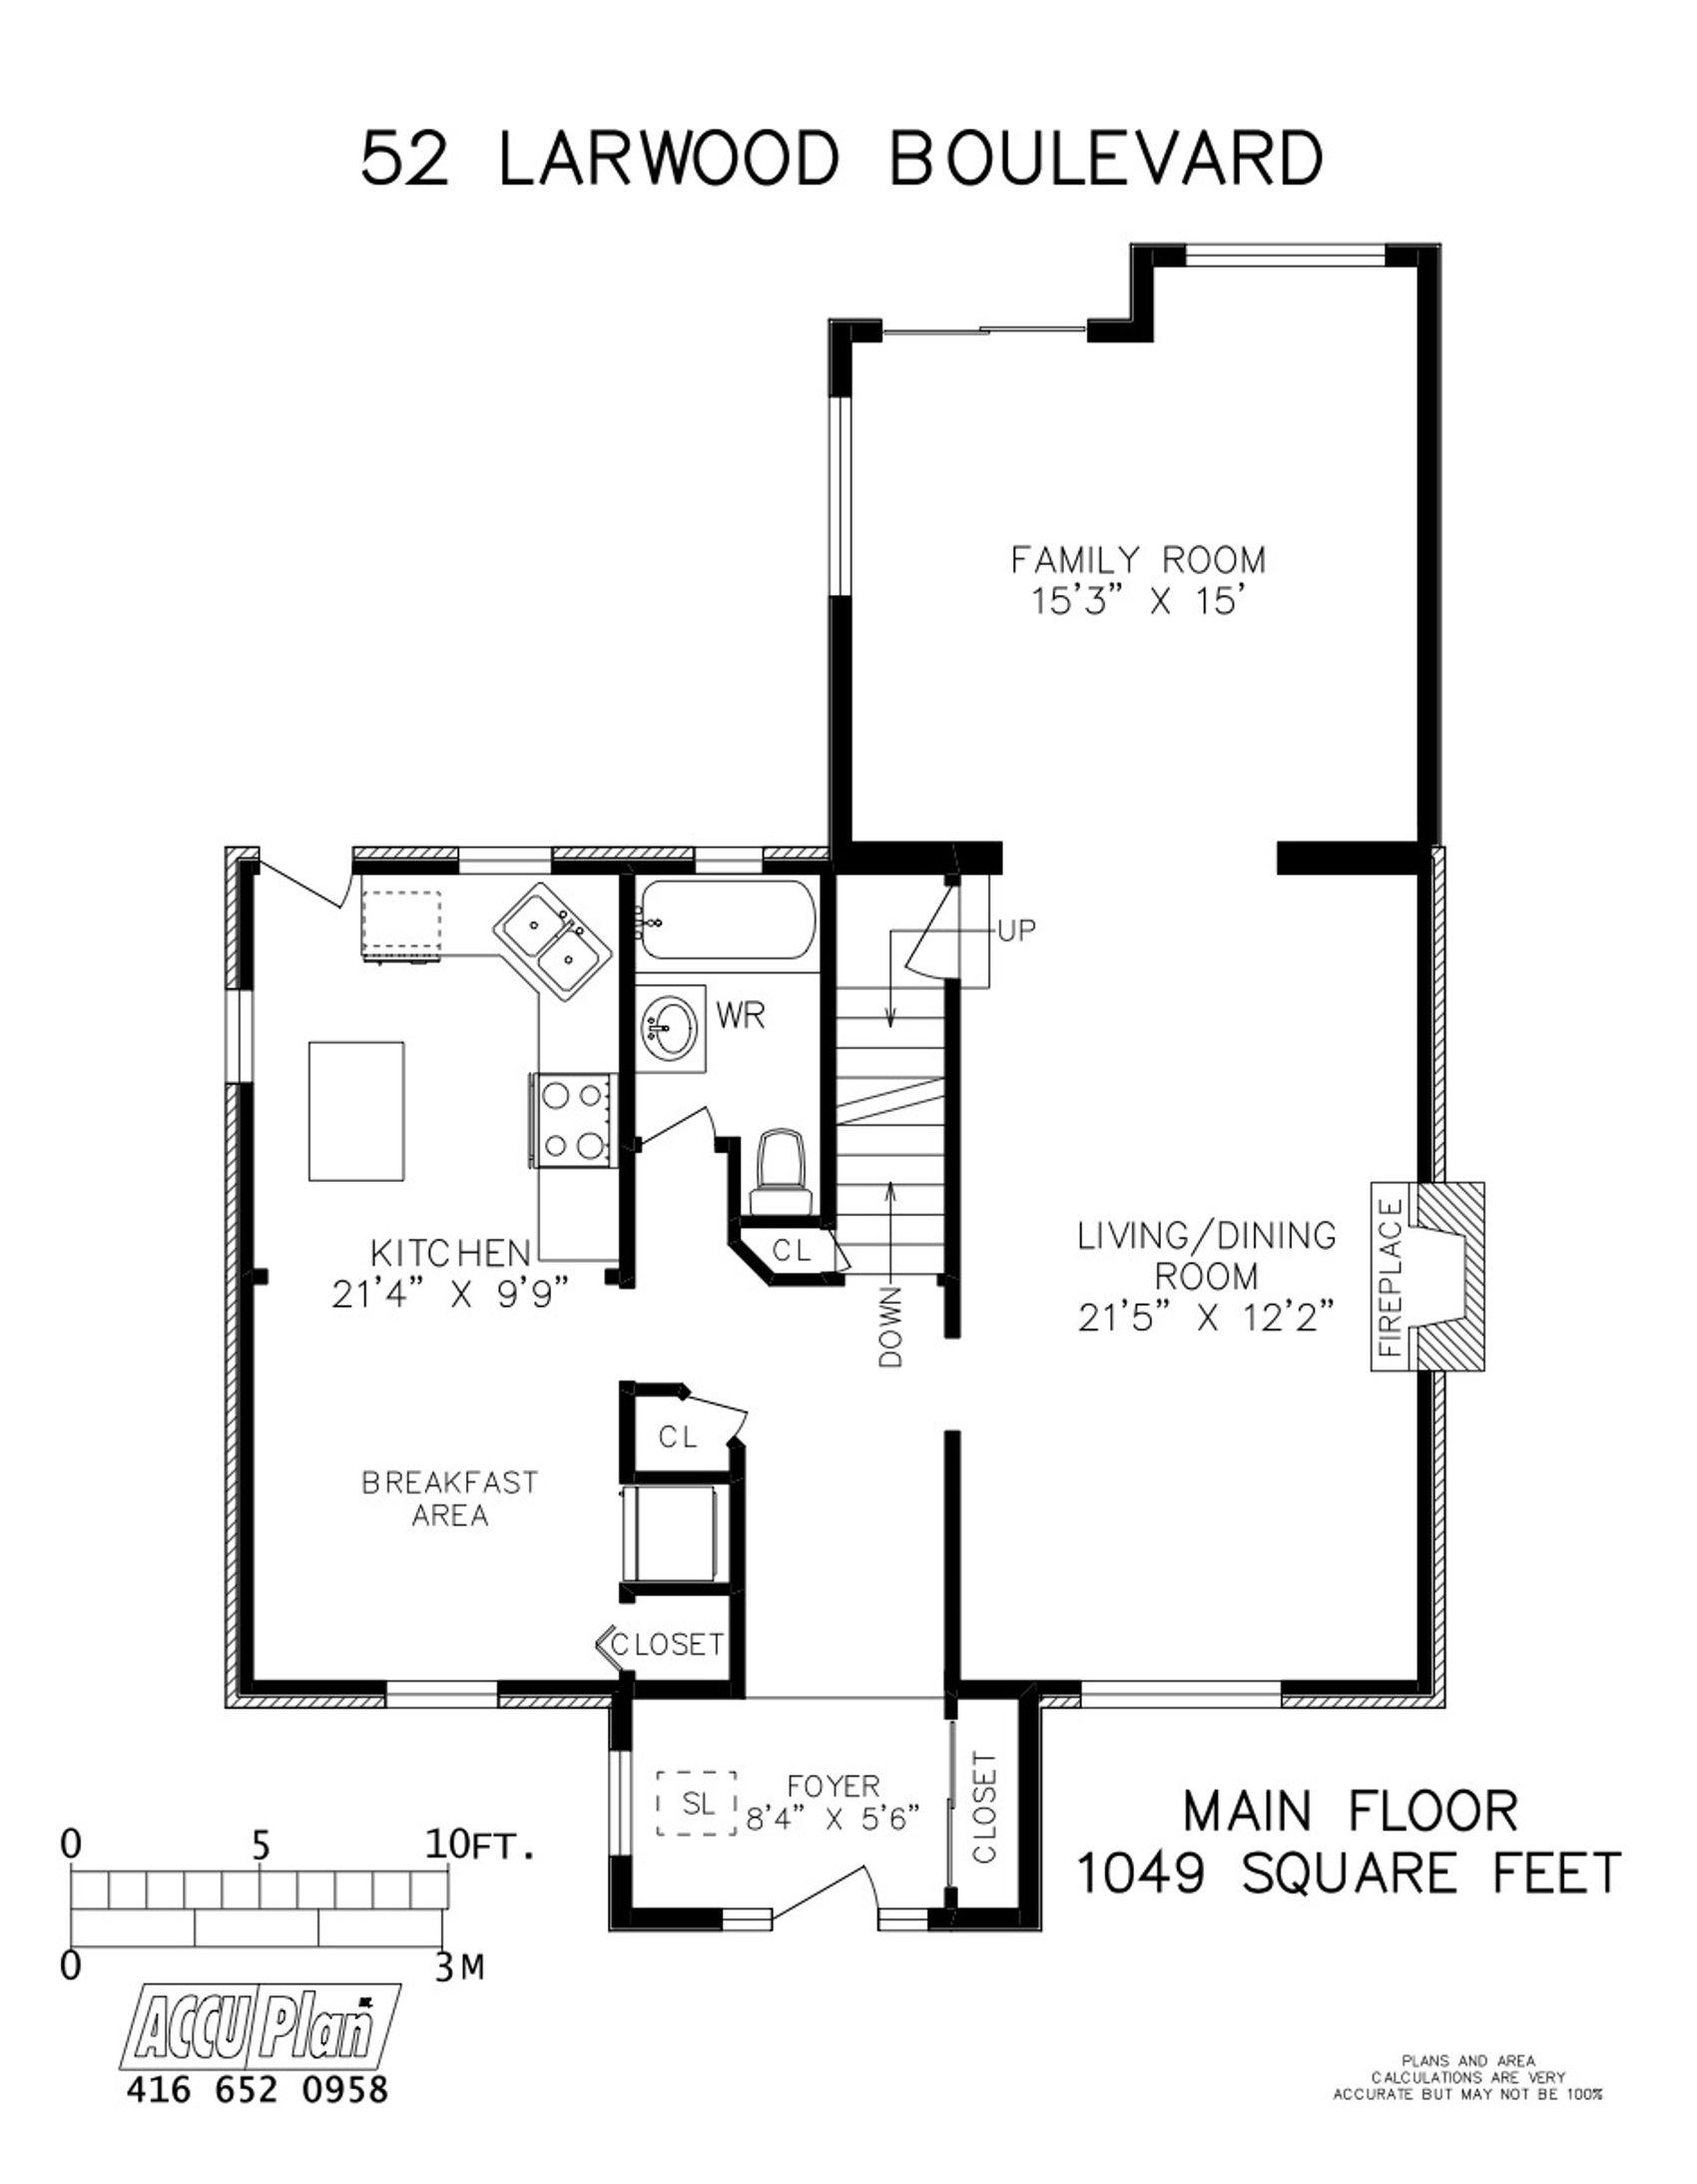 52 Larwood Blvd - Main Floor